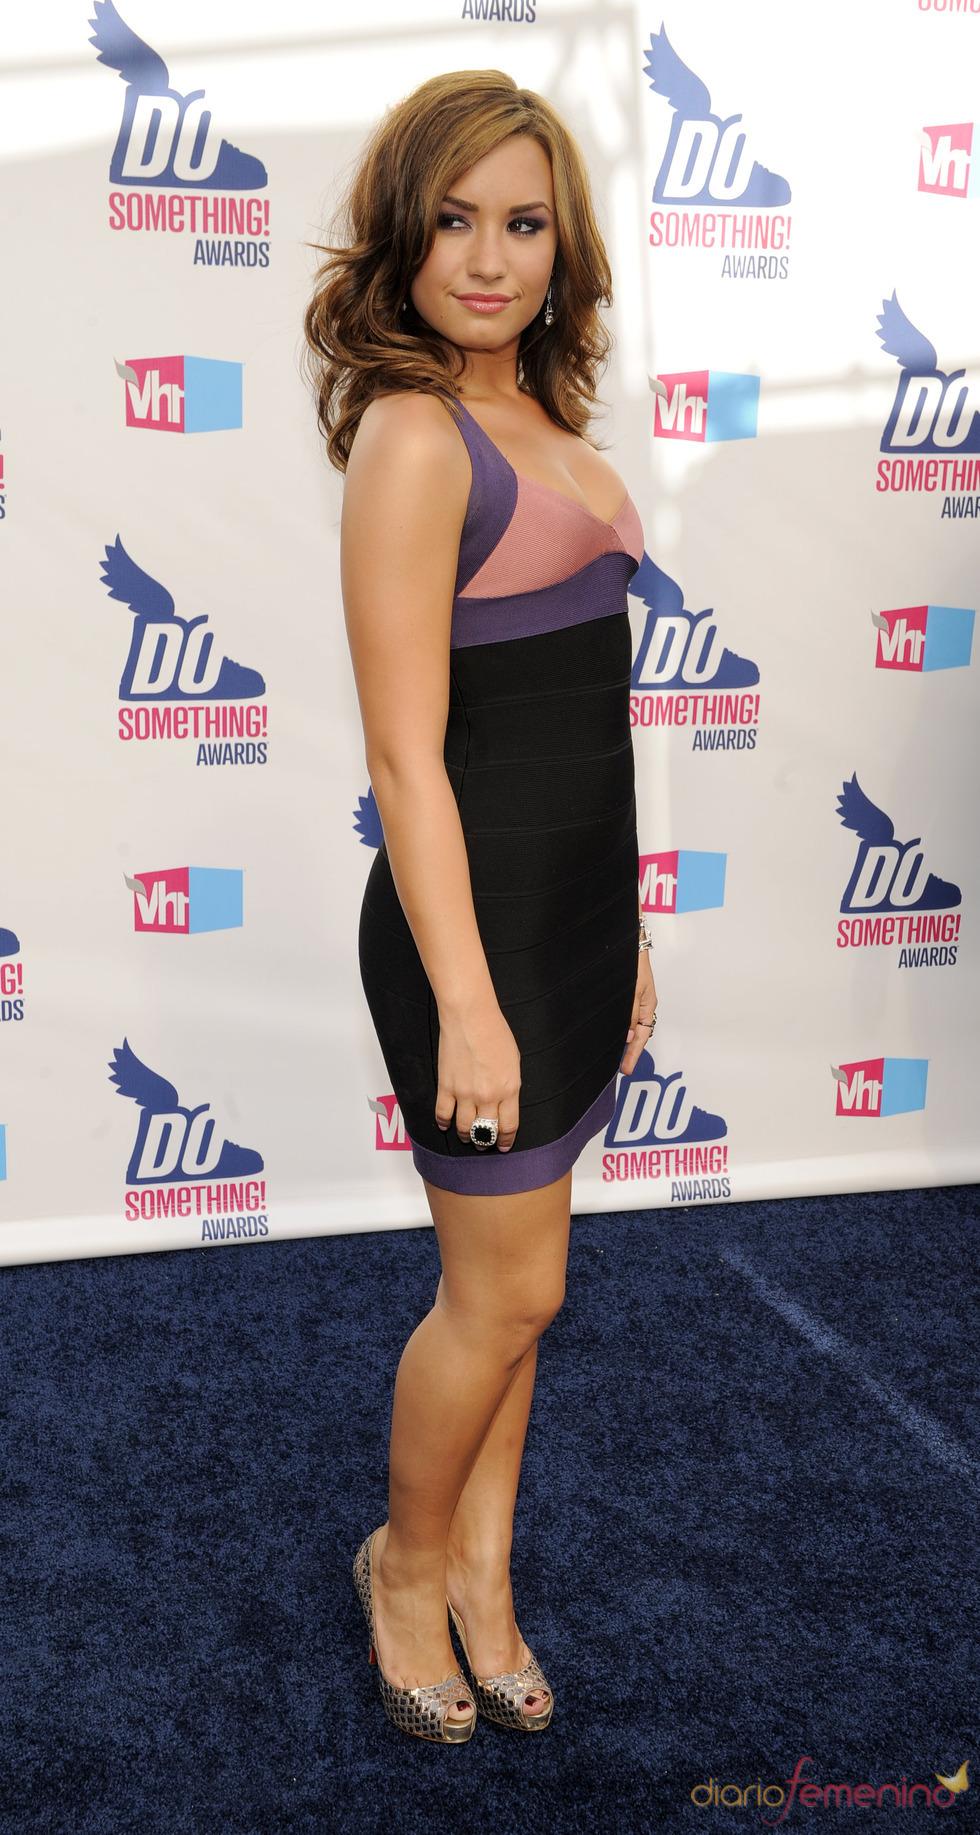 Demi Lovato en los premios Do Somethig